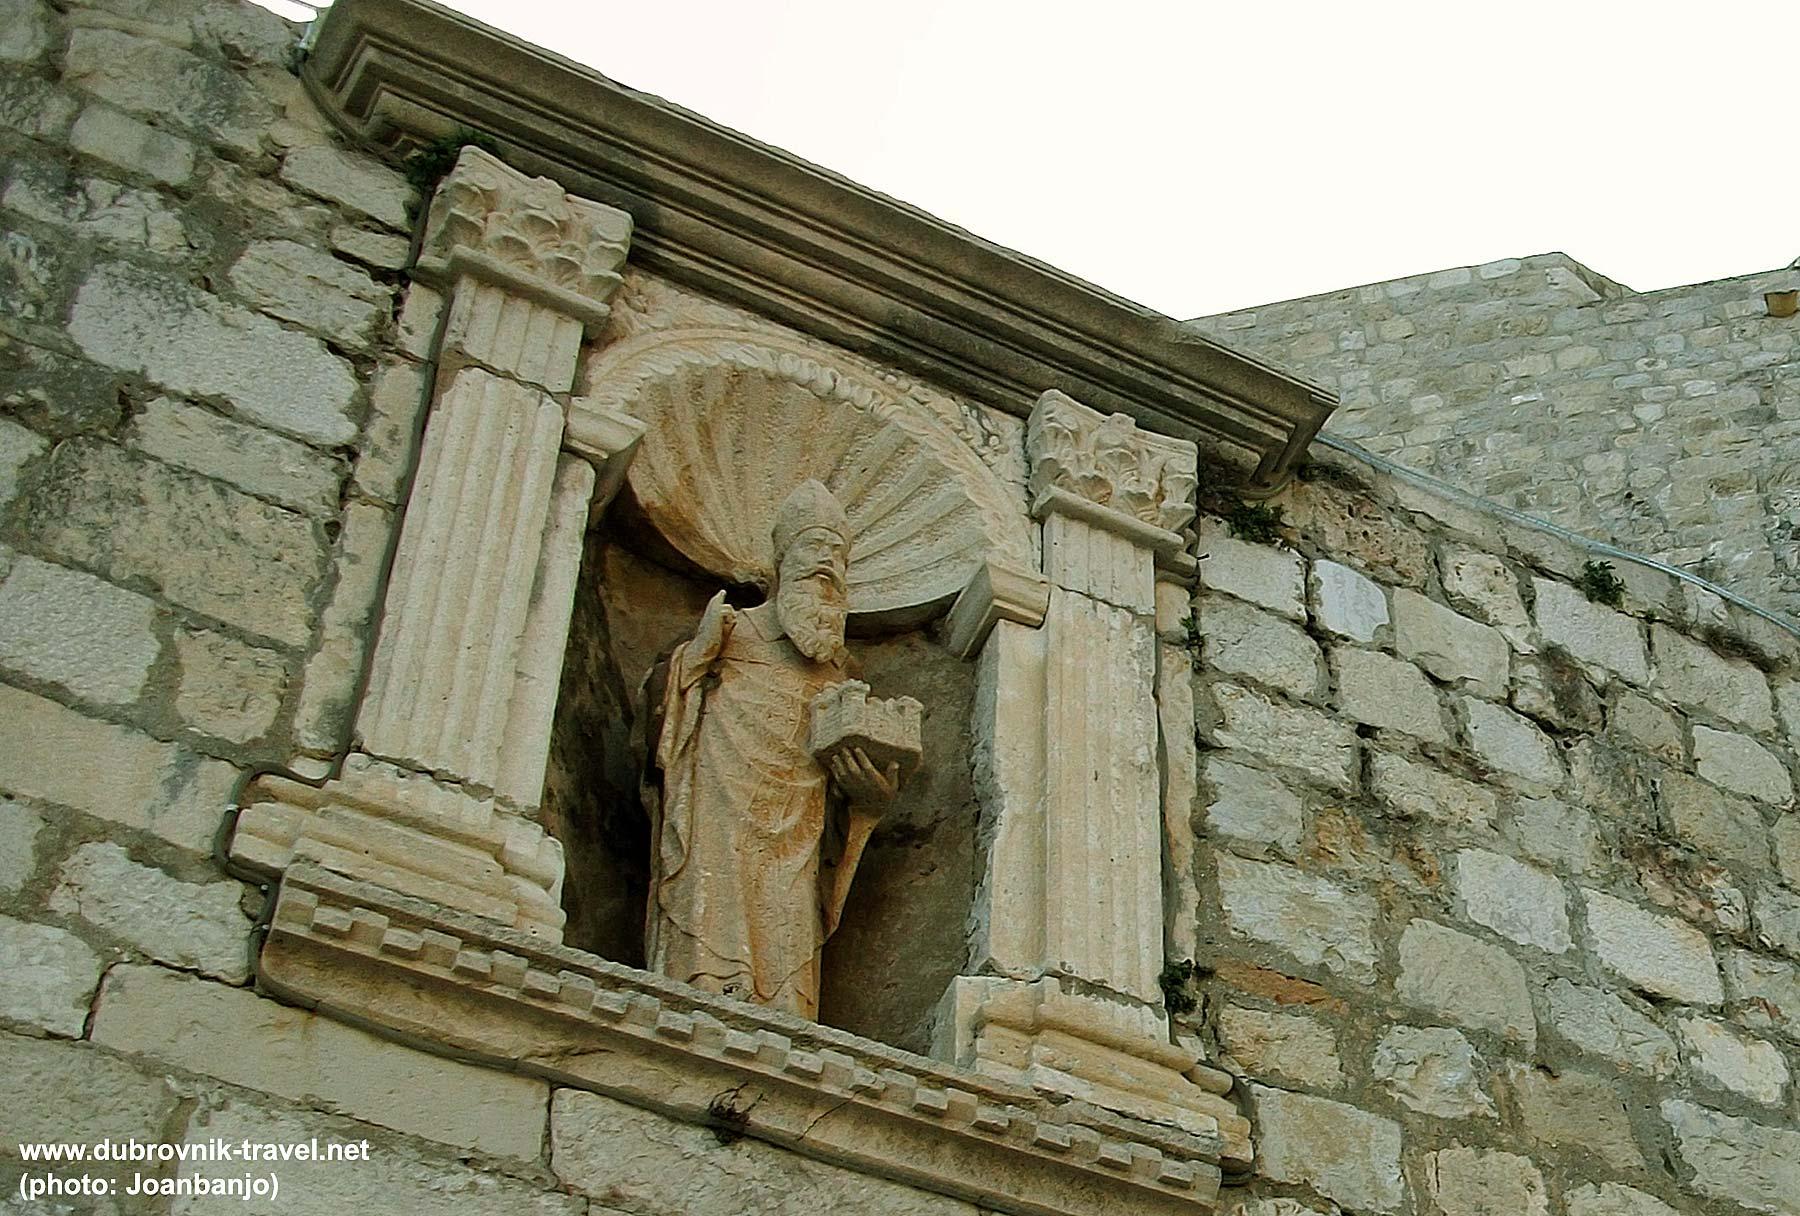 Statue of Sveti Vlaho, the patron saint of Dubrovnik at Ploce Gate